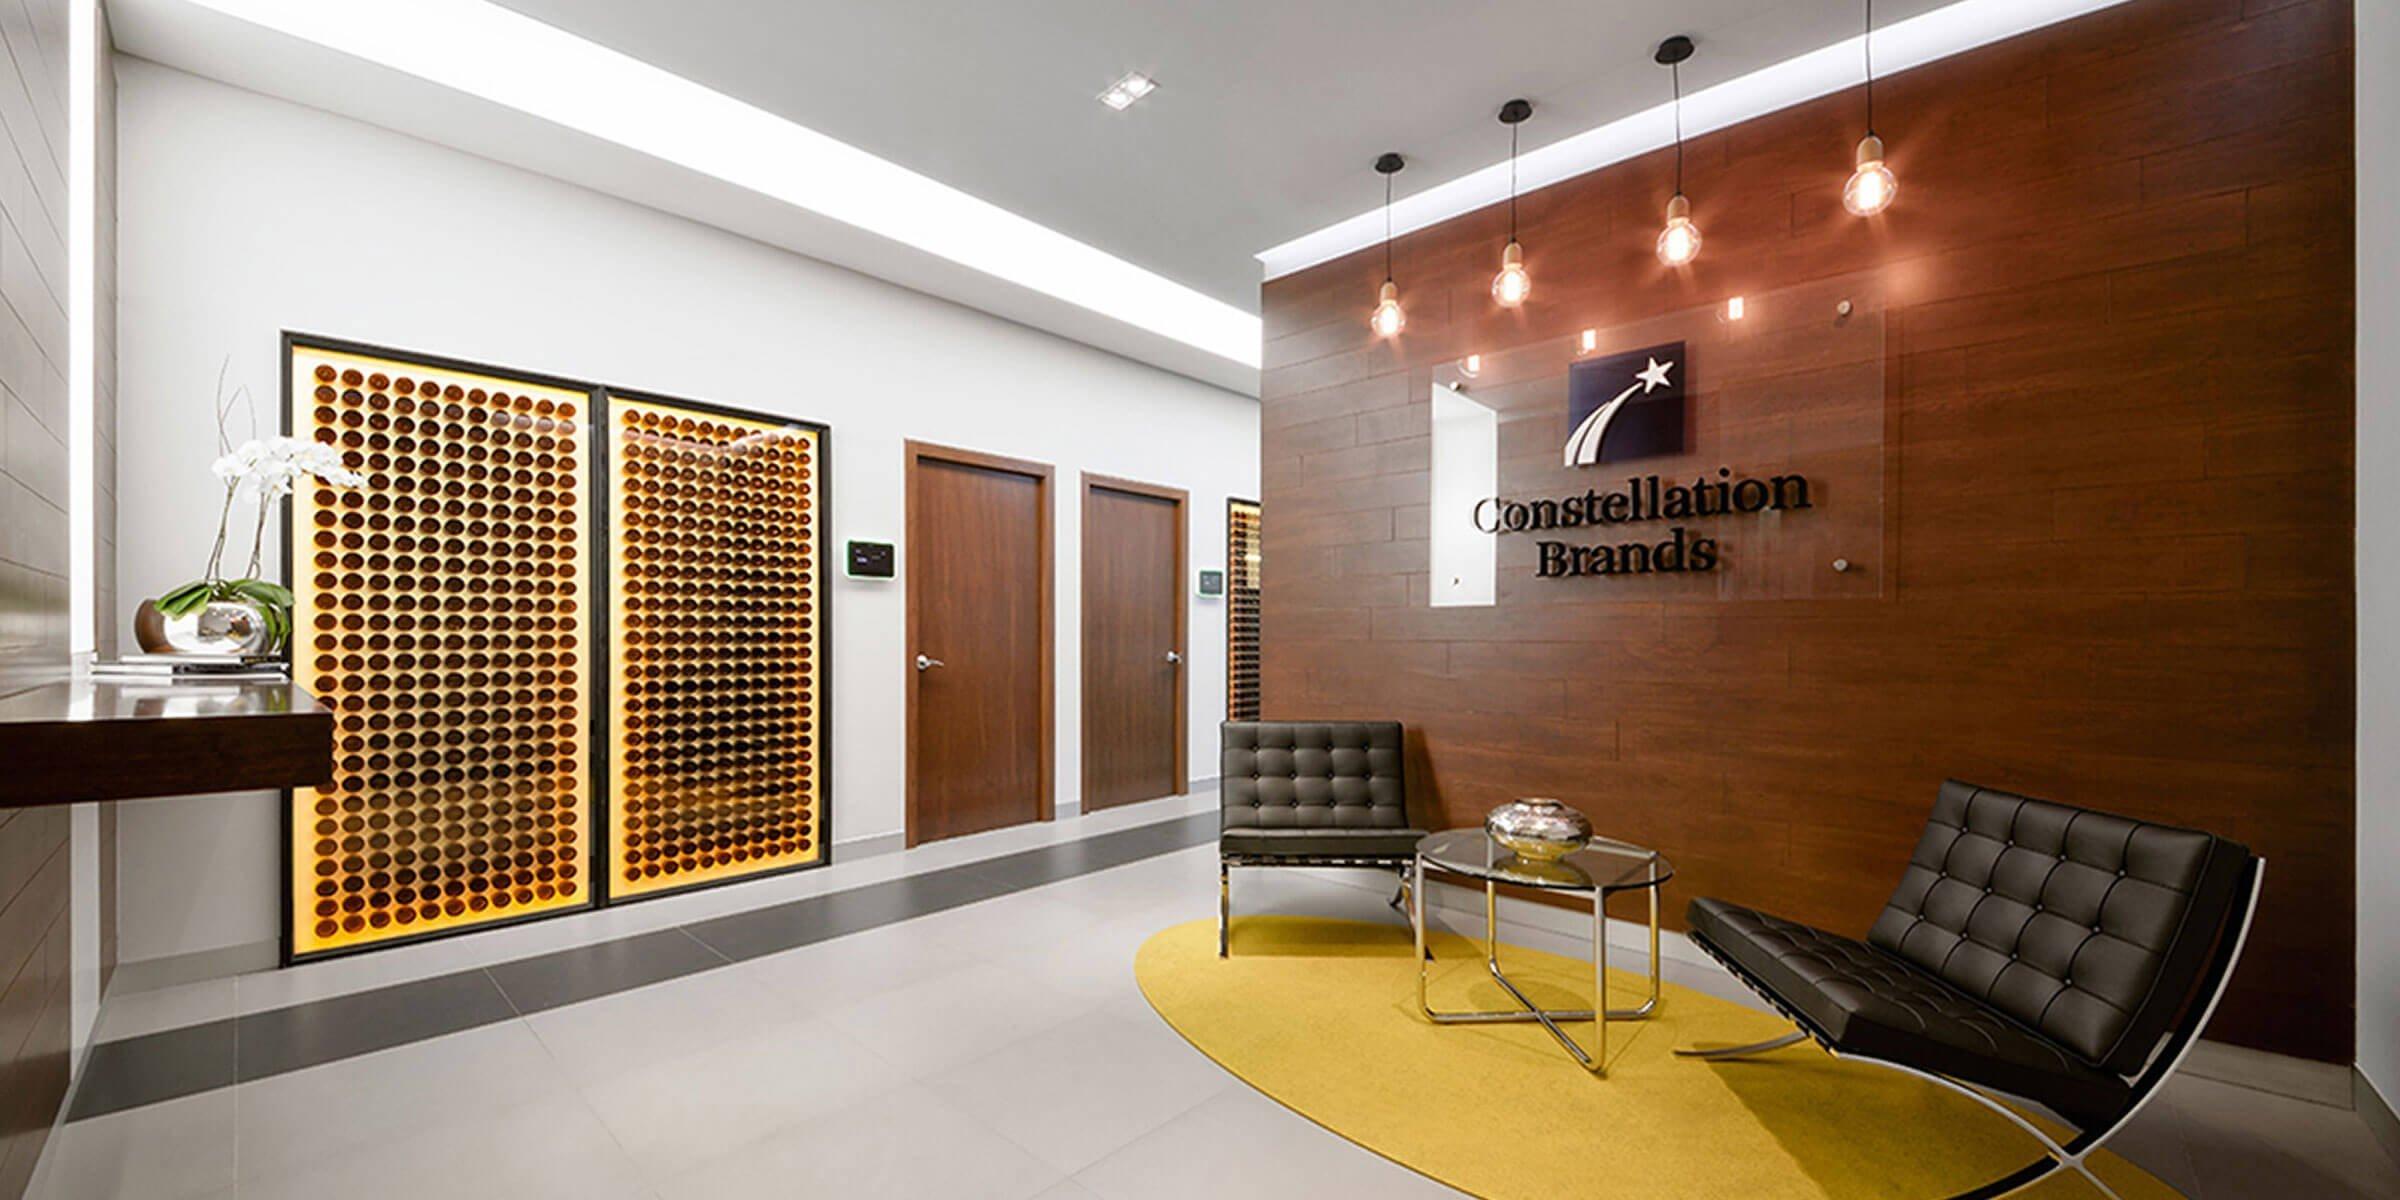 Constellation Brands Corporate Office Interior